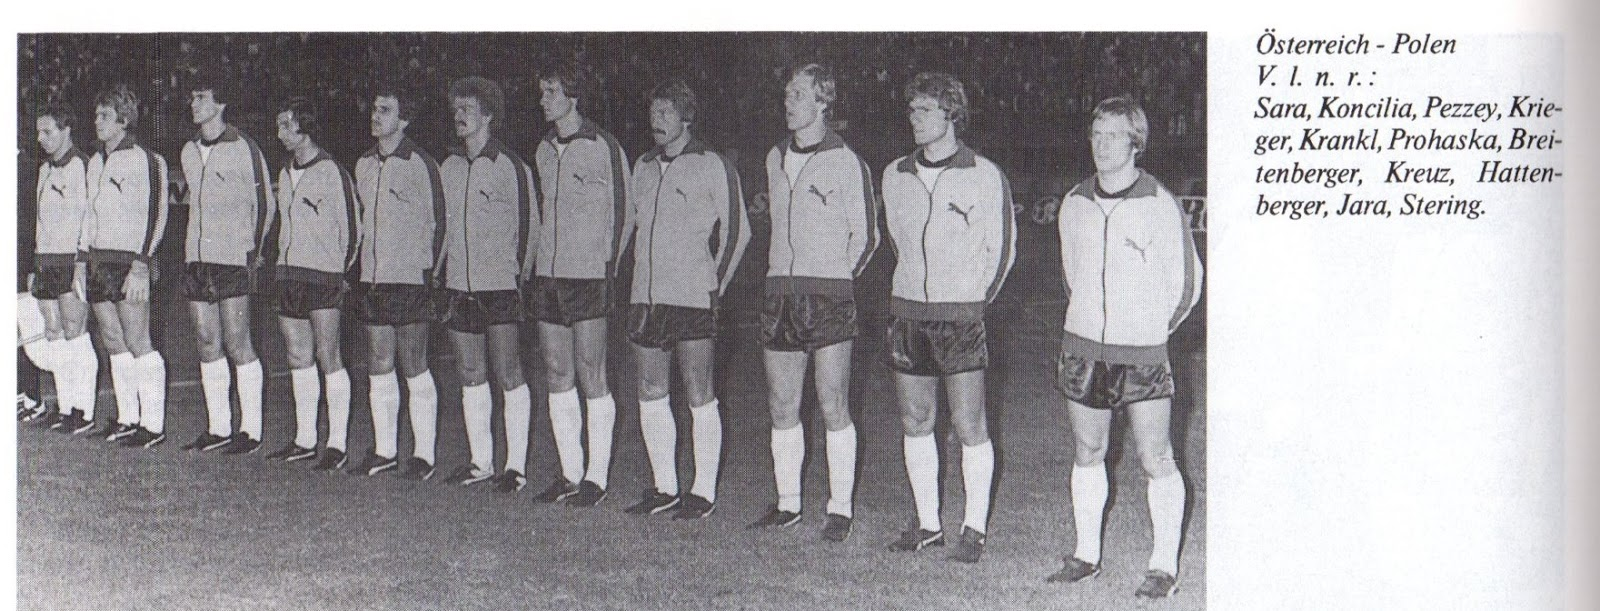 soccer nostalgia international season 1977 78, part 1  fu%c3%83%c2%9fball shorts c 24 #11